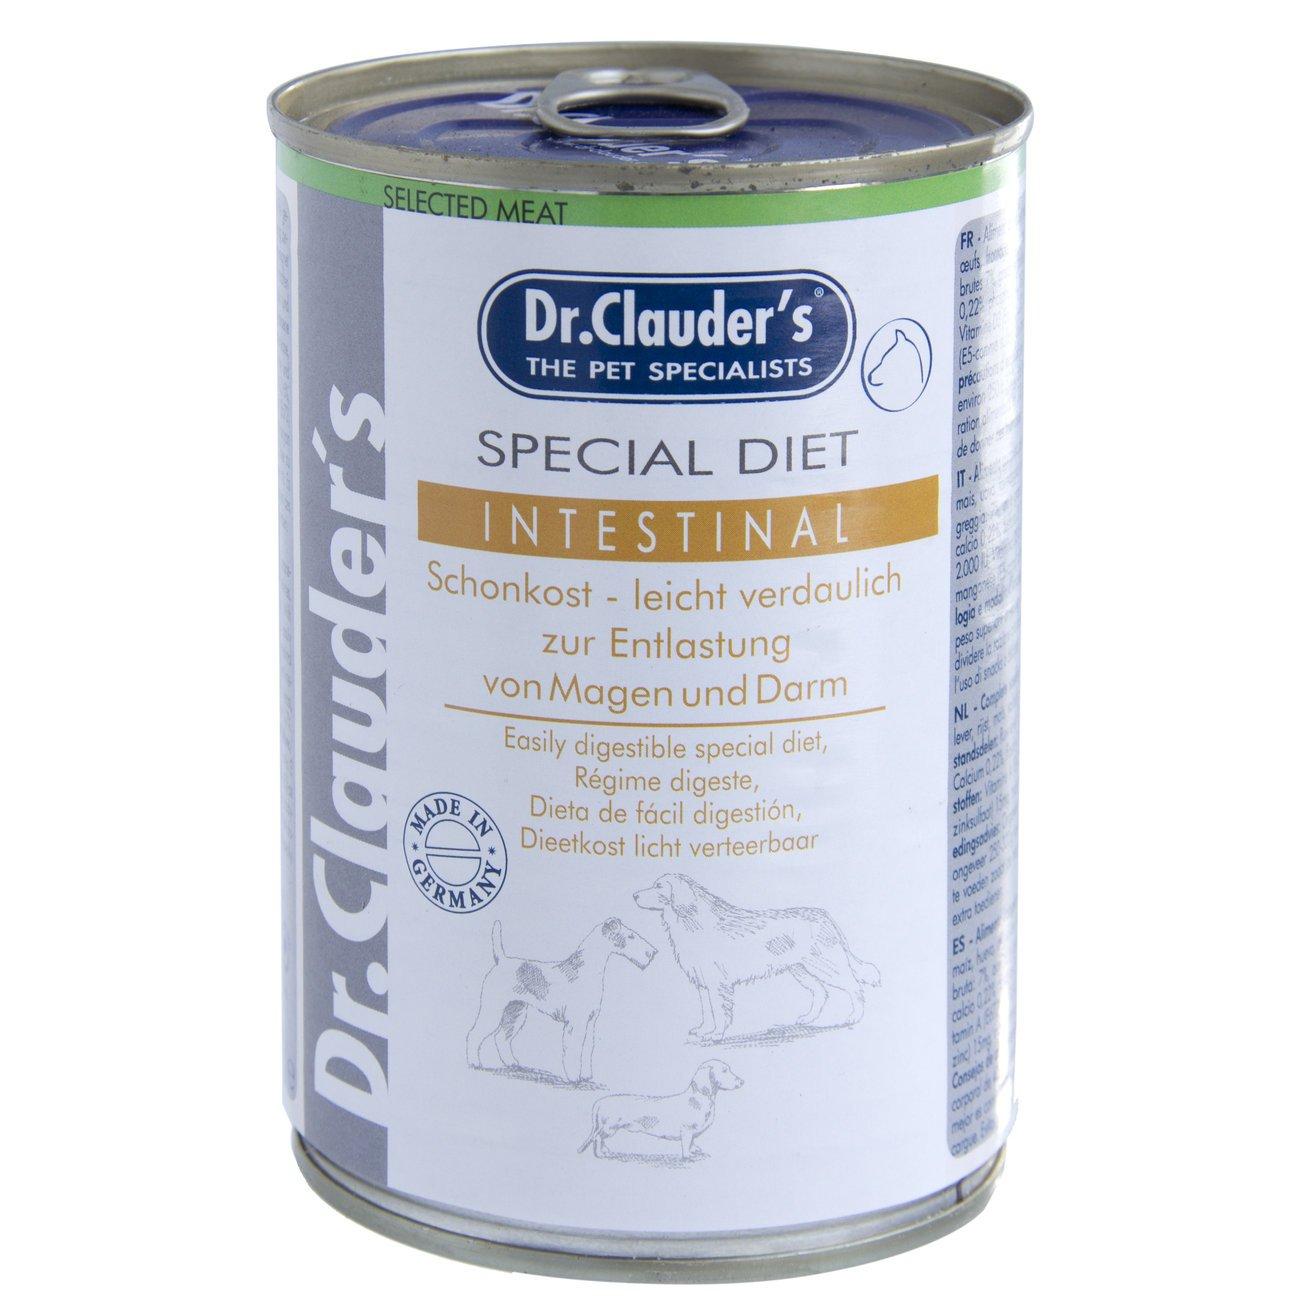 Dr. Clauders Special Diet Diät Schonkost Hundefutter, Bild 3